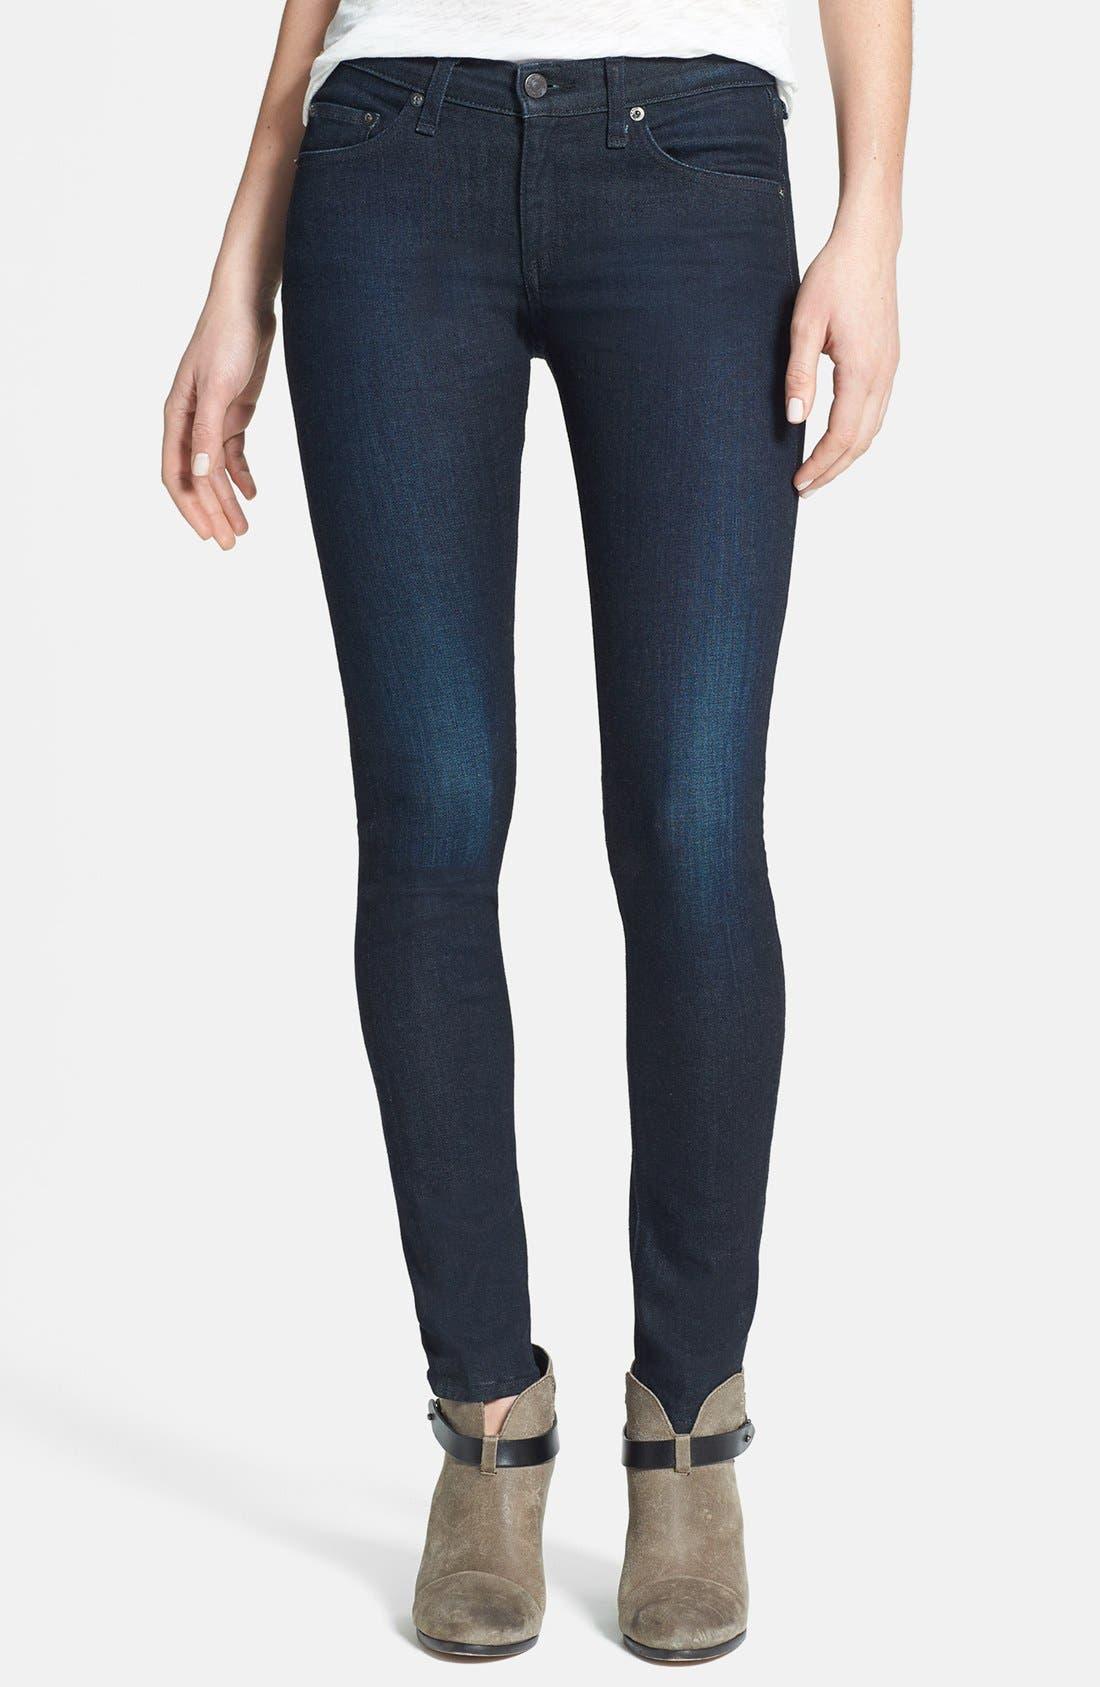 Alternate Image 1 Selected - rag & bone/JEAN Skinny Stretch Jeans (Heritage)